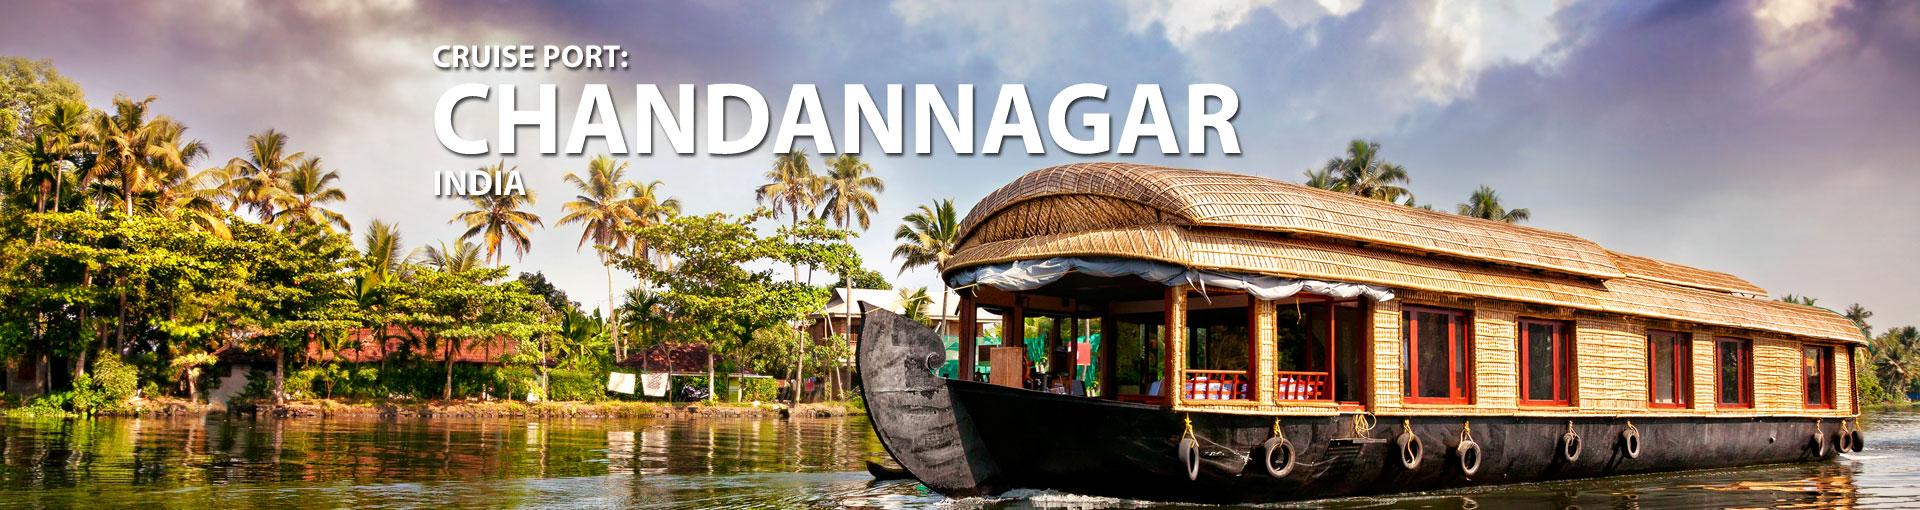 Cruises to Chandannagar, India